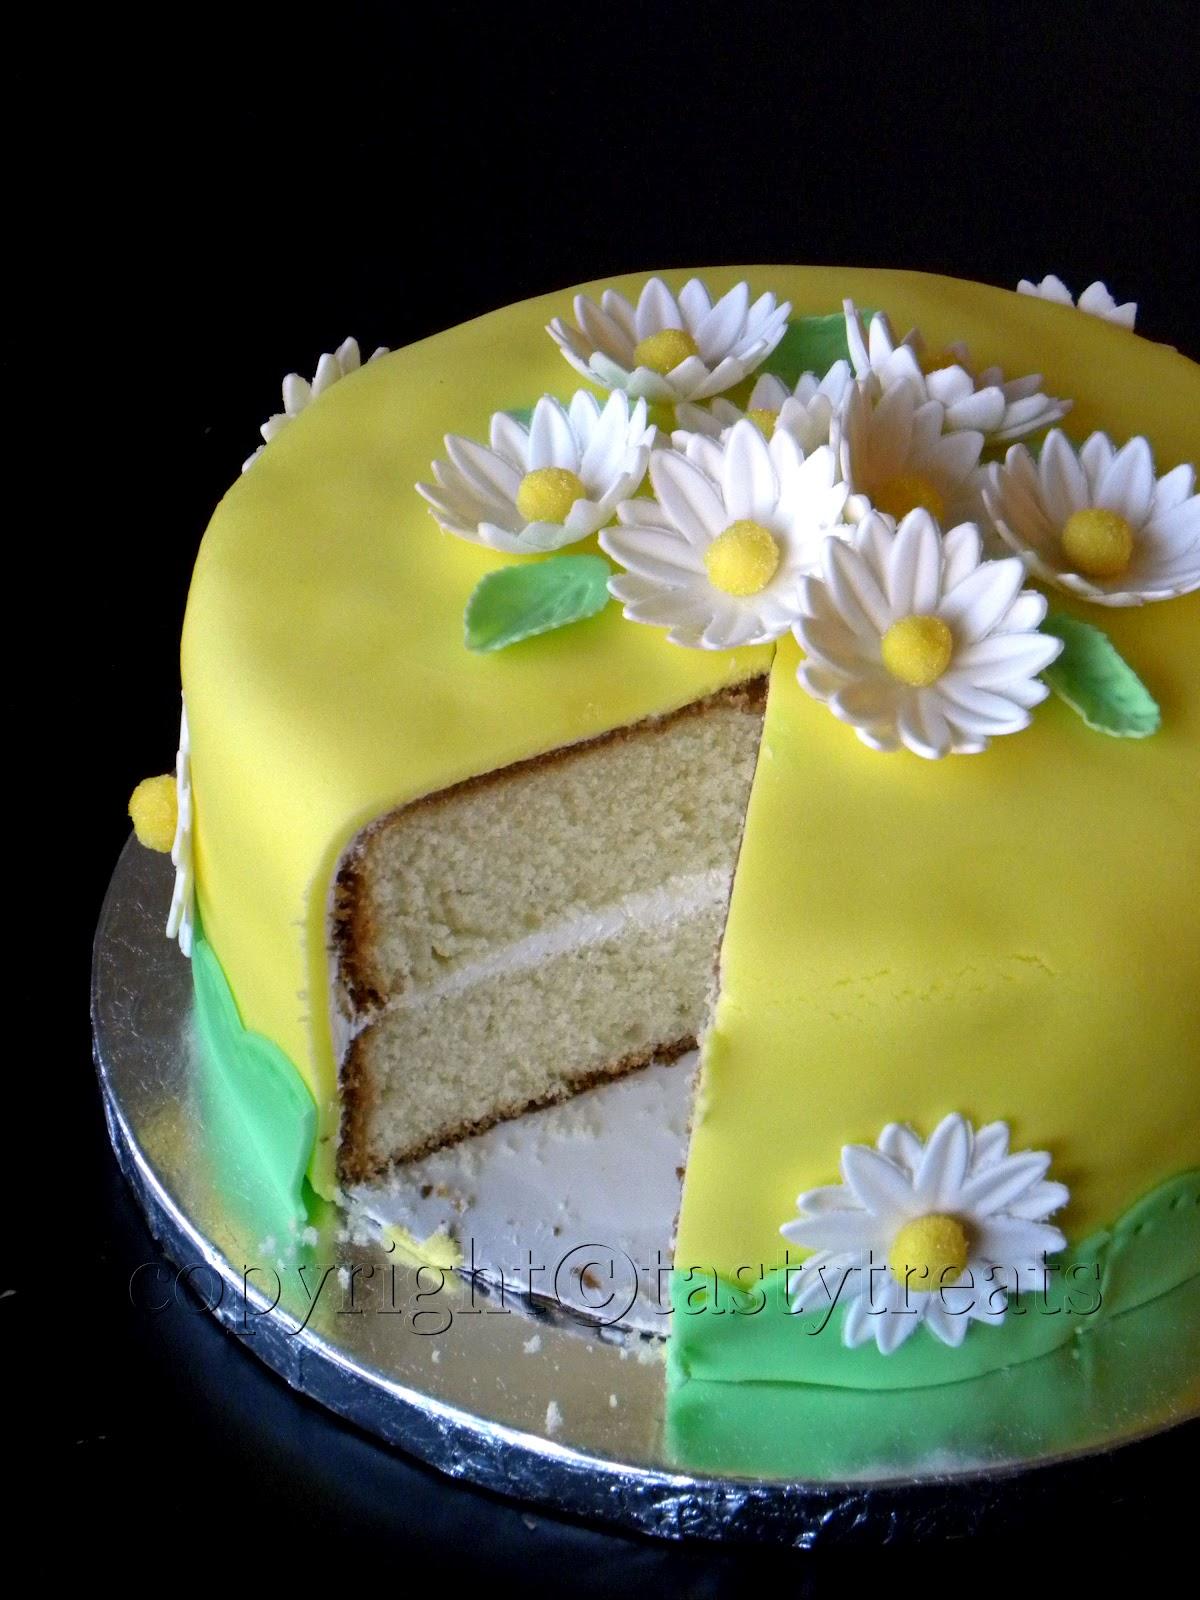 Tasty Treats My First Fondant Cake A Very Moist Yellow